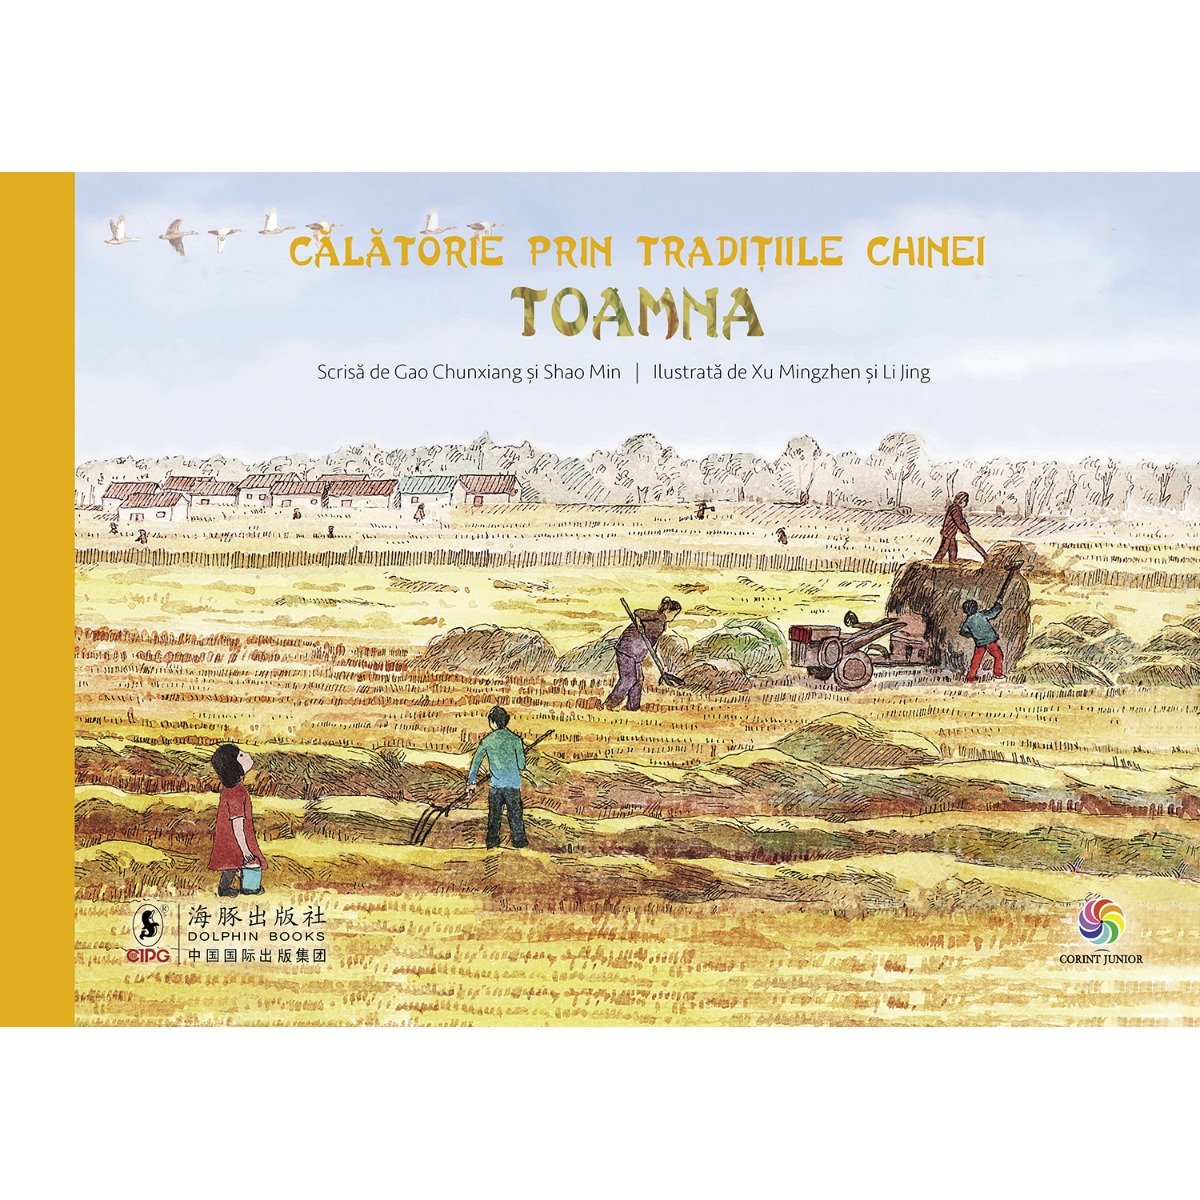 Carte Editura Corint, Calatorie prin traditiile Chinei. Toamna, Gao Chunxiang, Shao Min